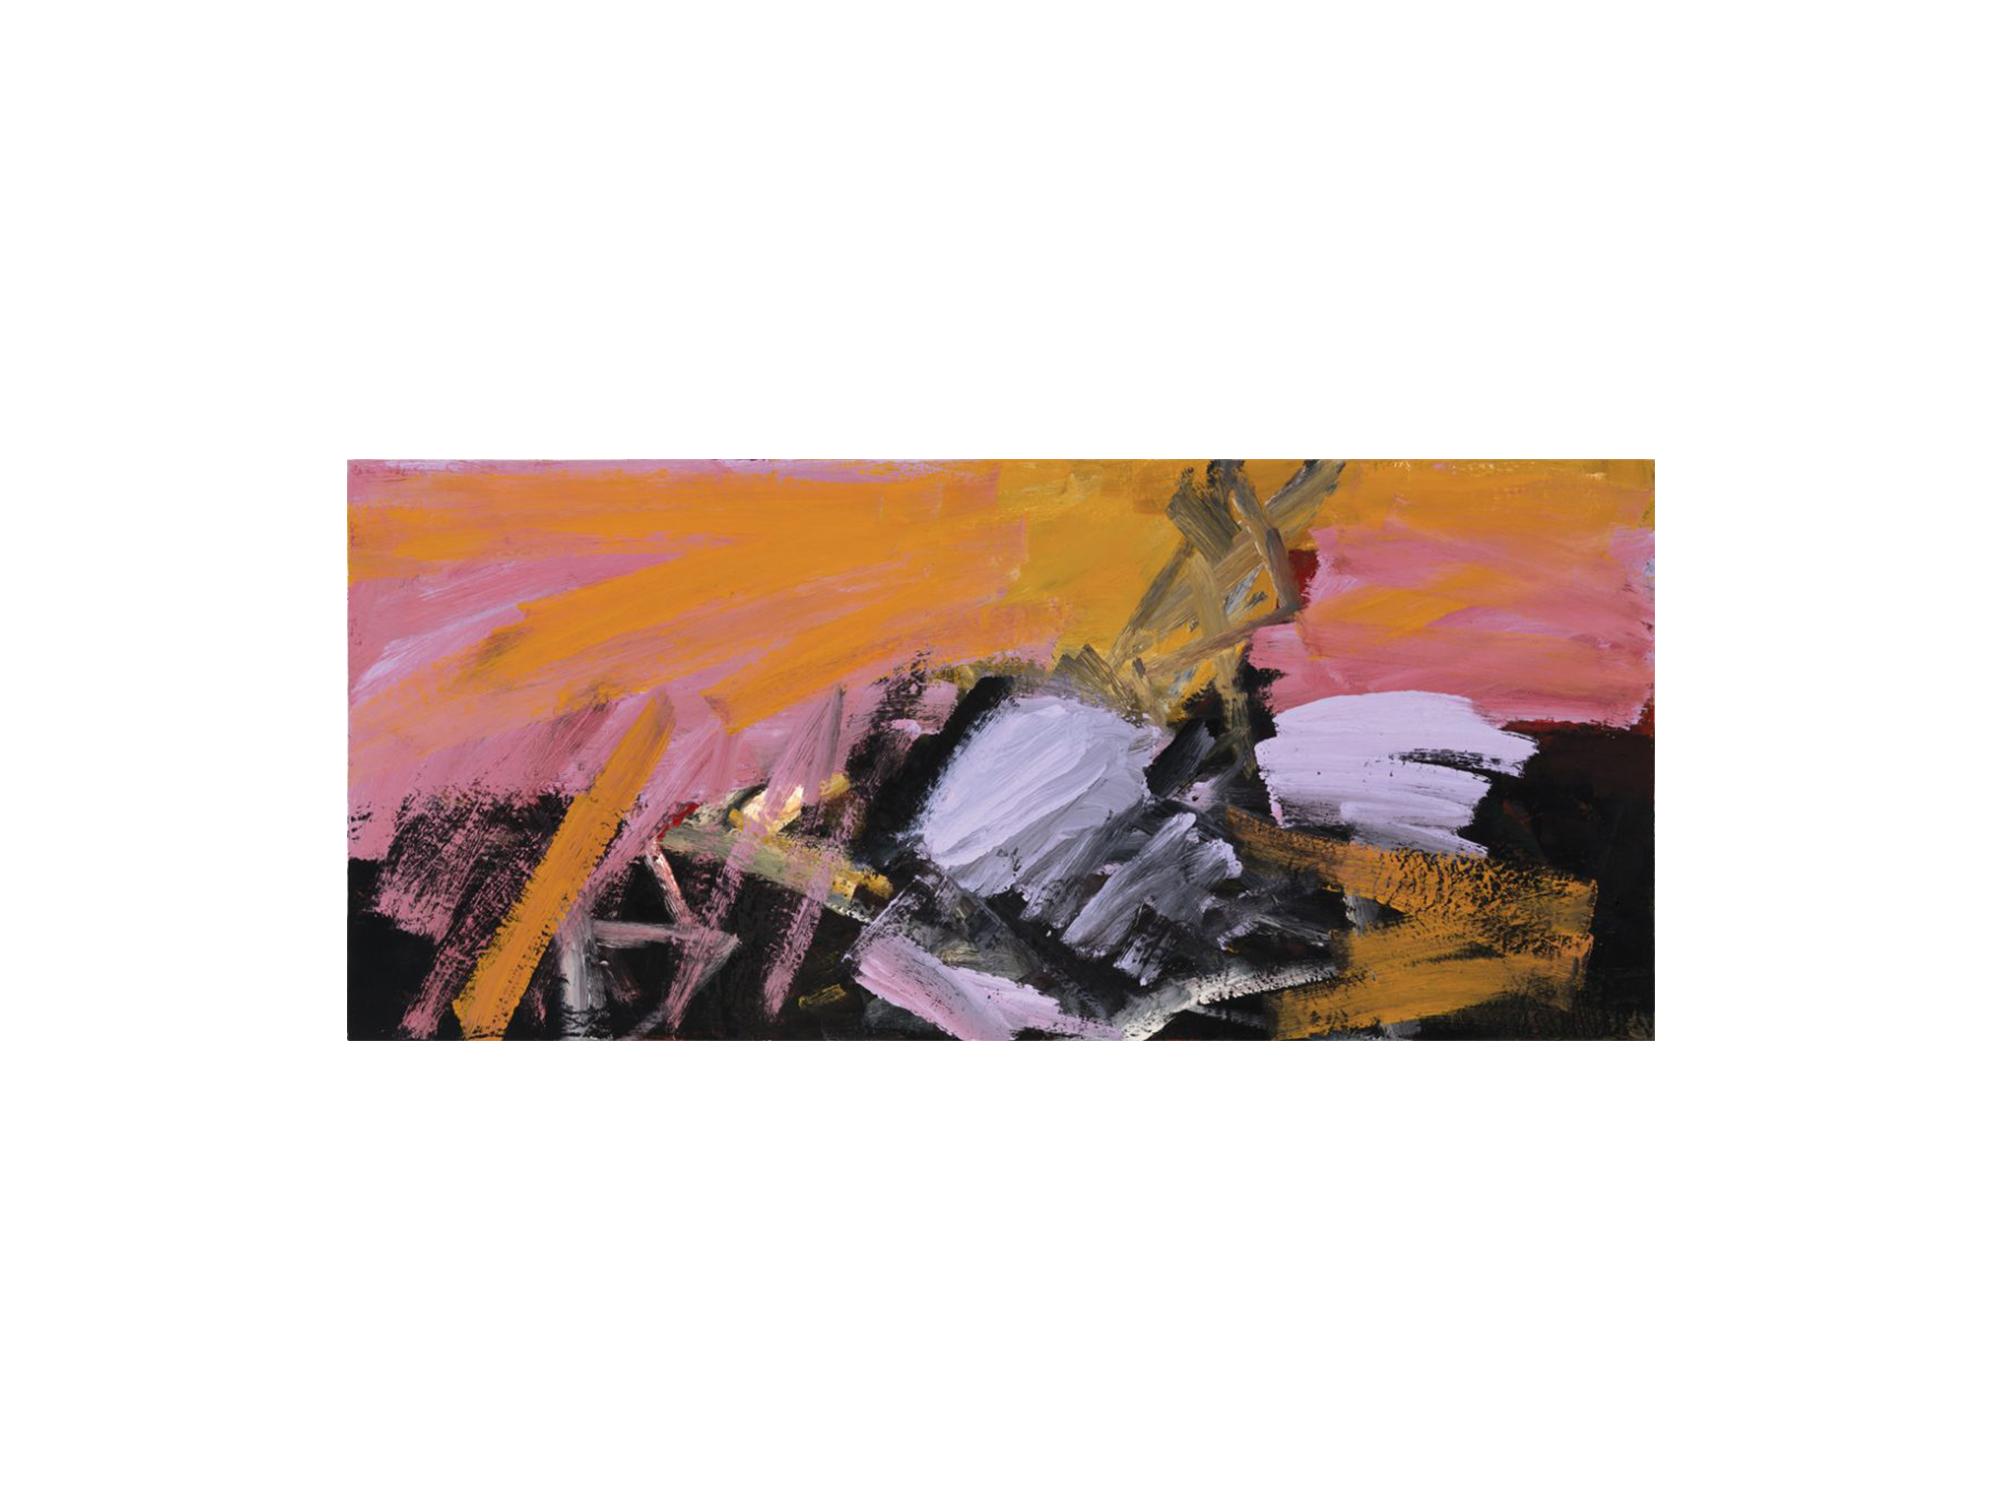 James Clayden   Lookout , 2016 enamel on board 31.5 x 71cm   ARTIST BIO